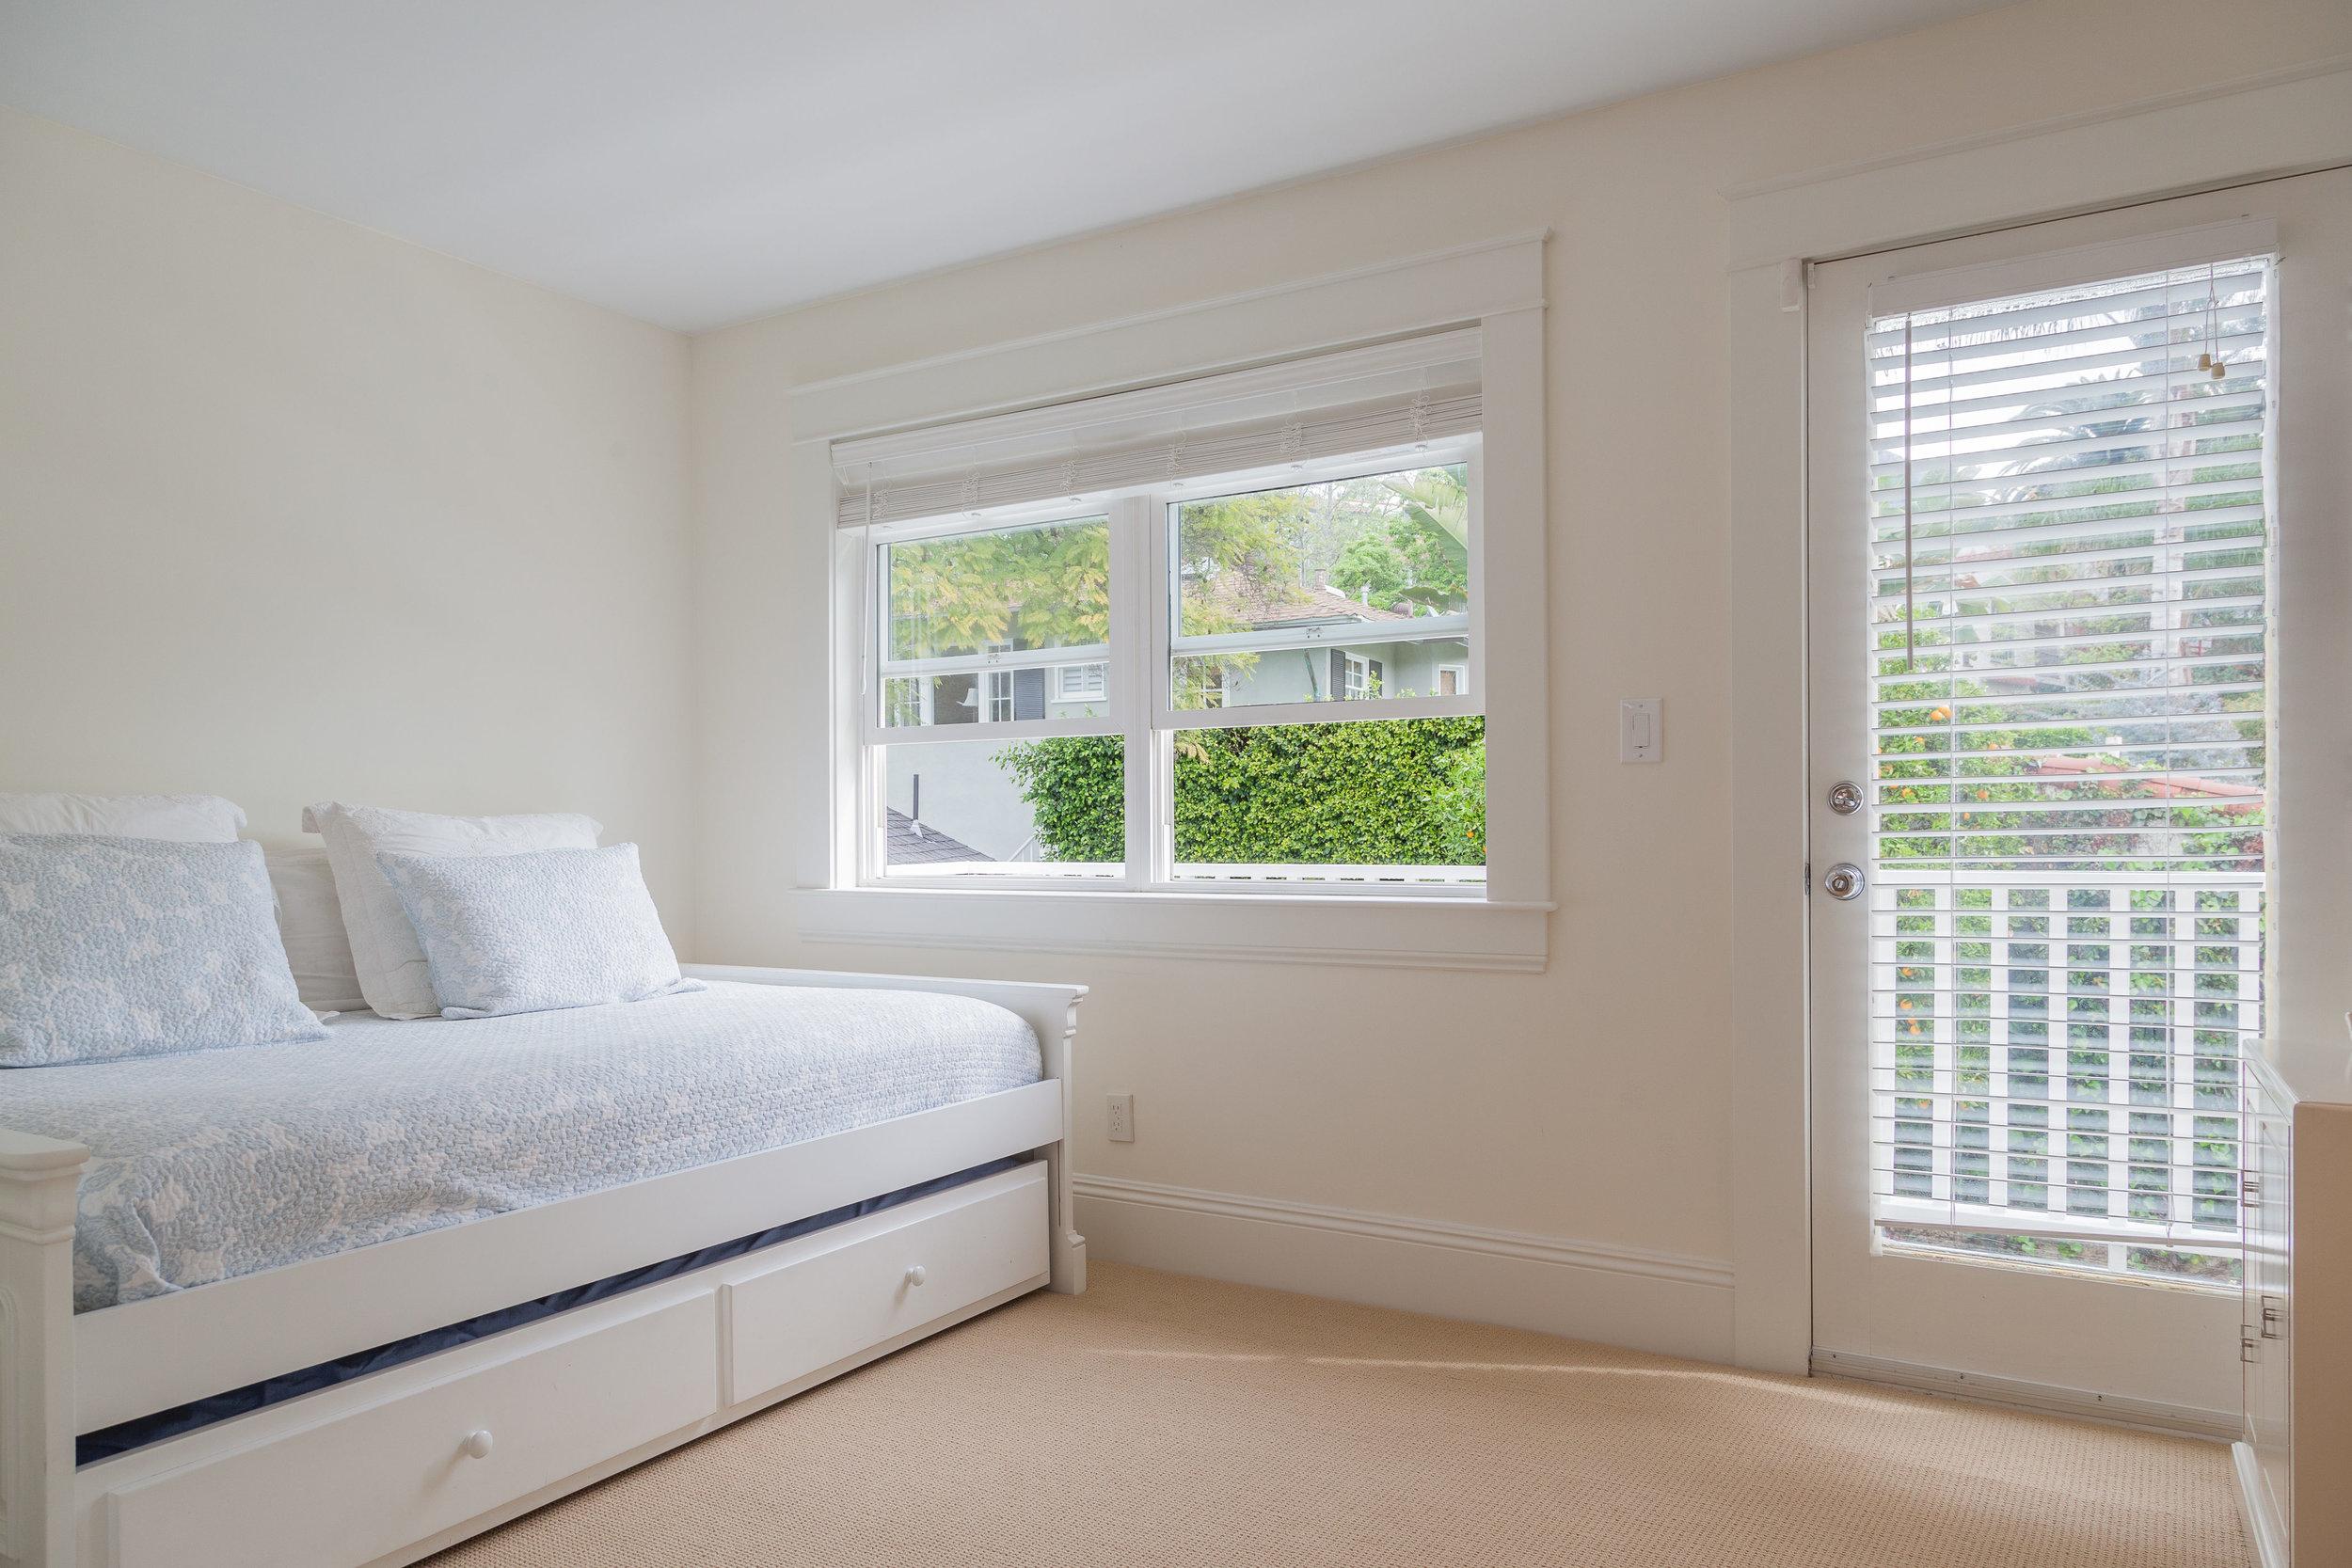 3163 La Suvida Dr Los Angeles-print-031-Bedroom-4200x2800-300dpi.jpg